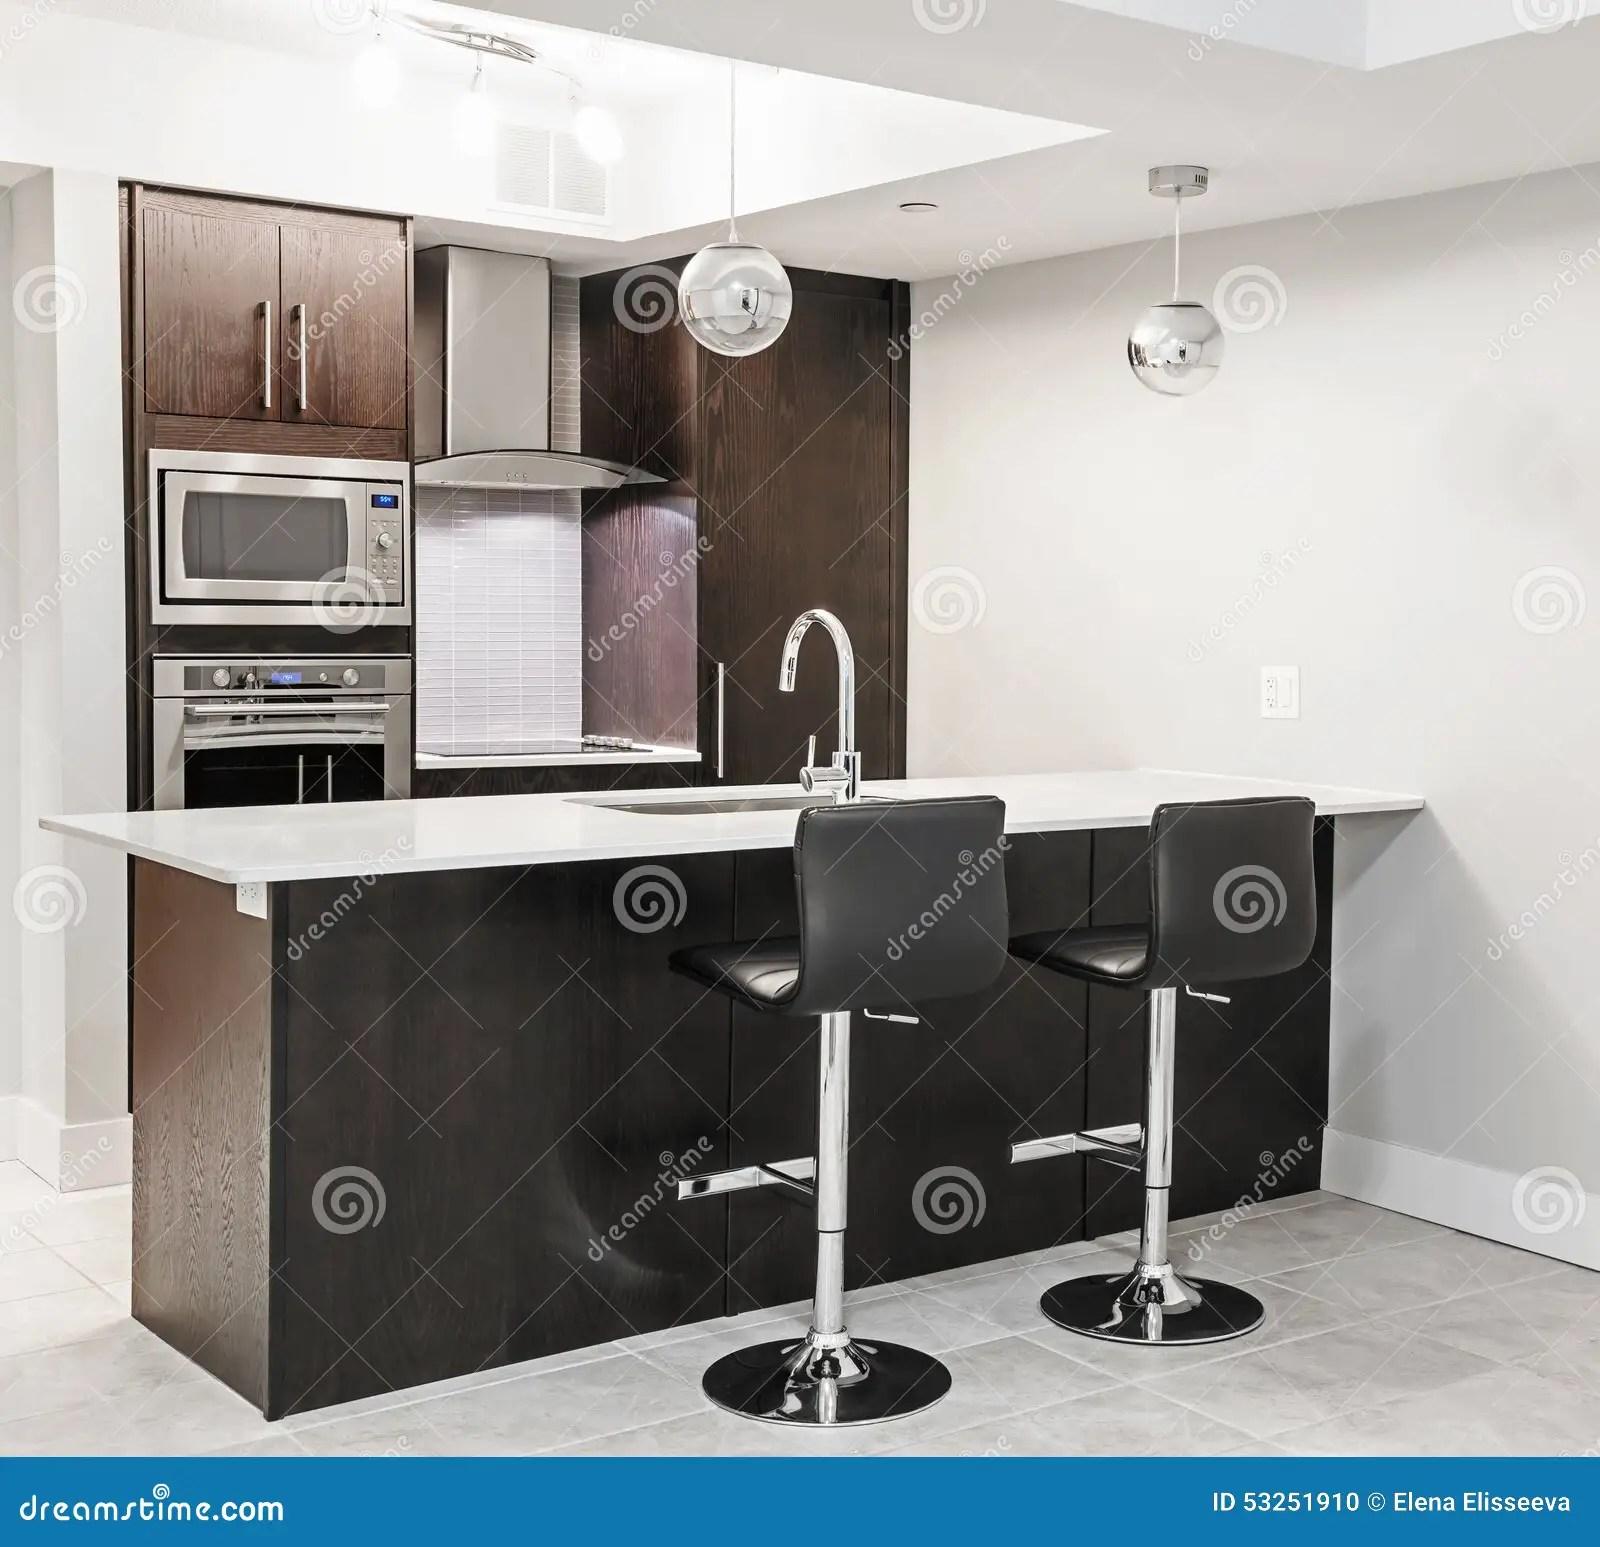 Modern Kitchen Interior Stock Photo Image Of Appliances